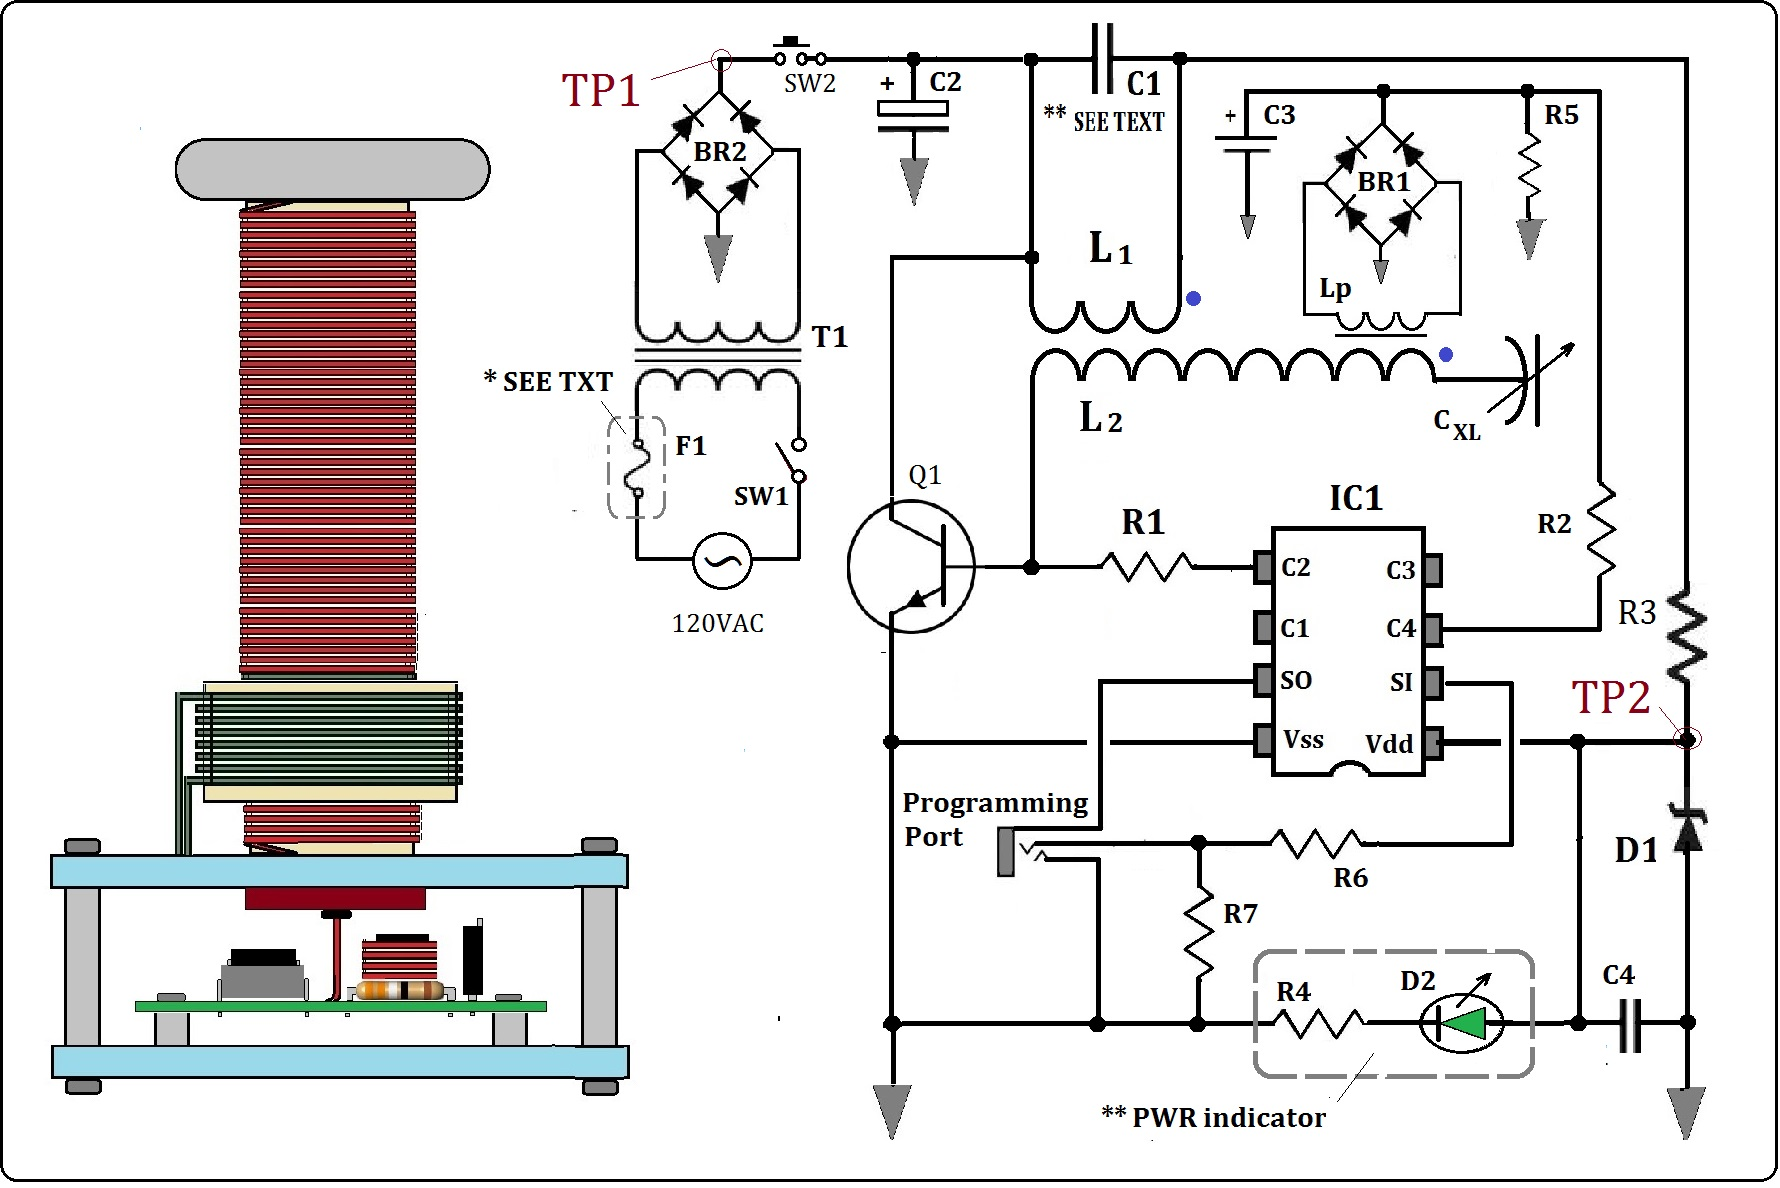 hight resolution of batesla coil details matthewscottbates microwave oven tesla coil solid state tesla coil schematic